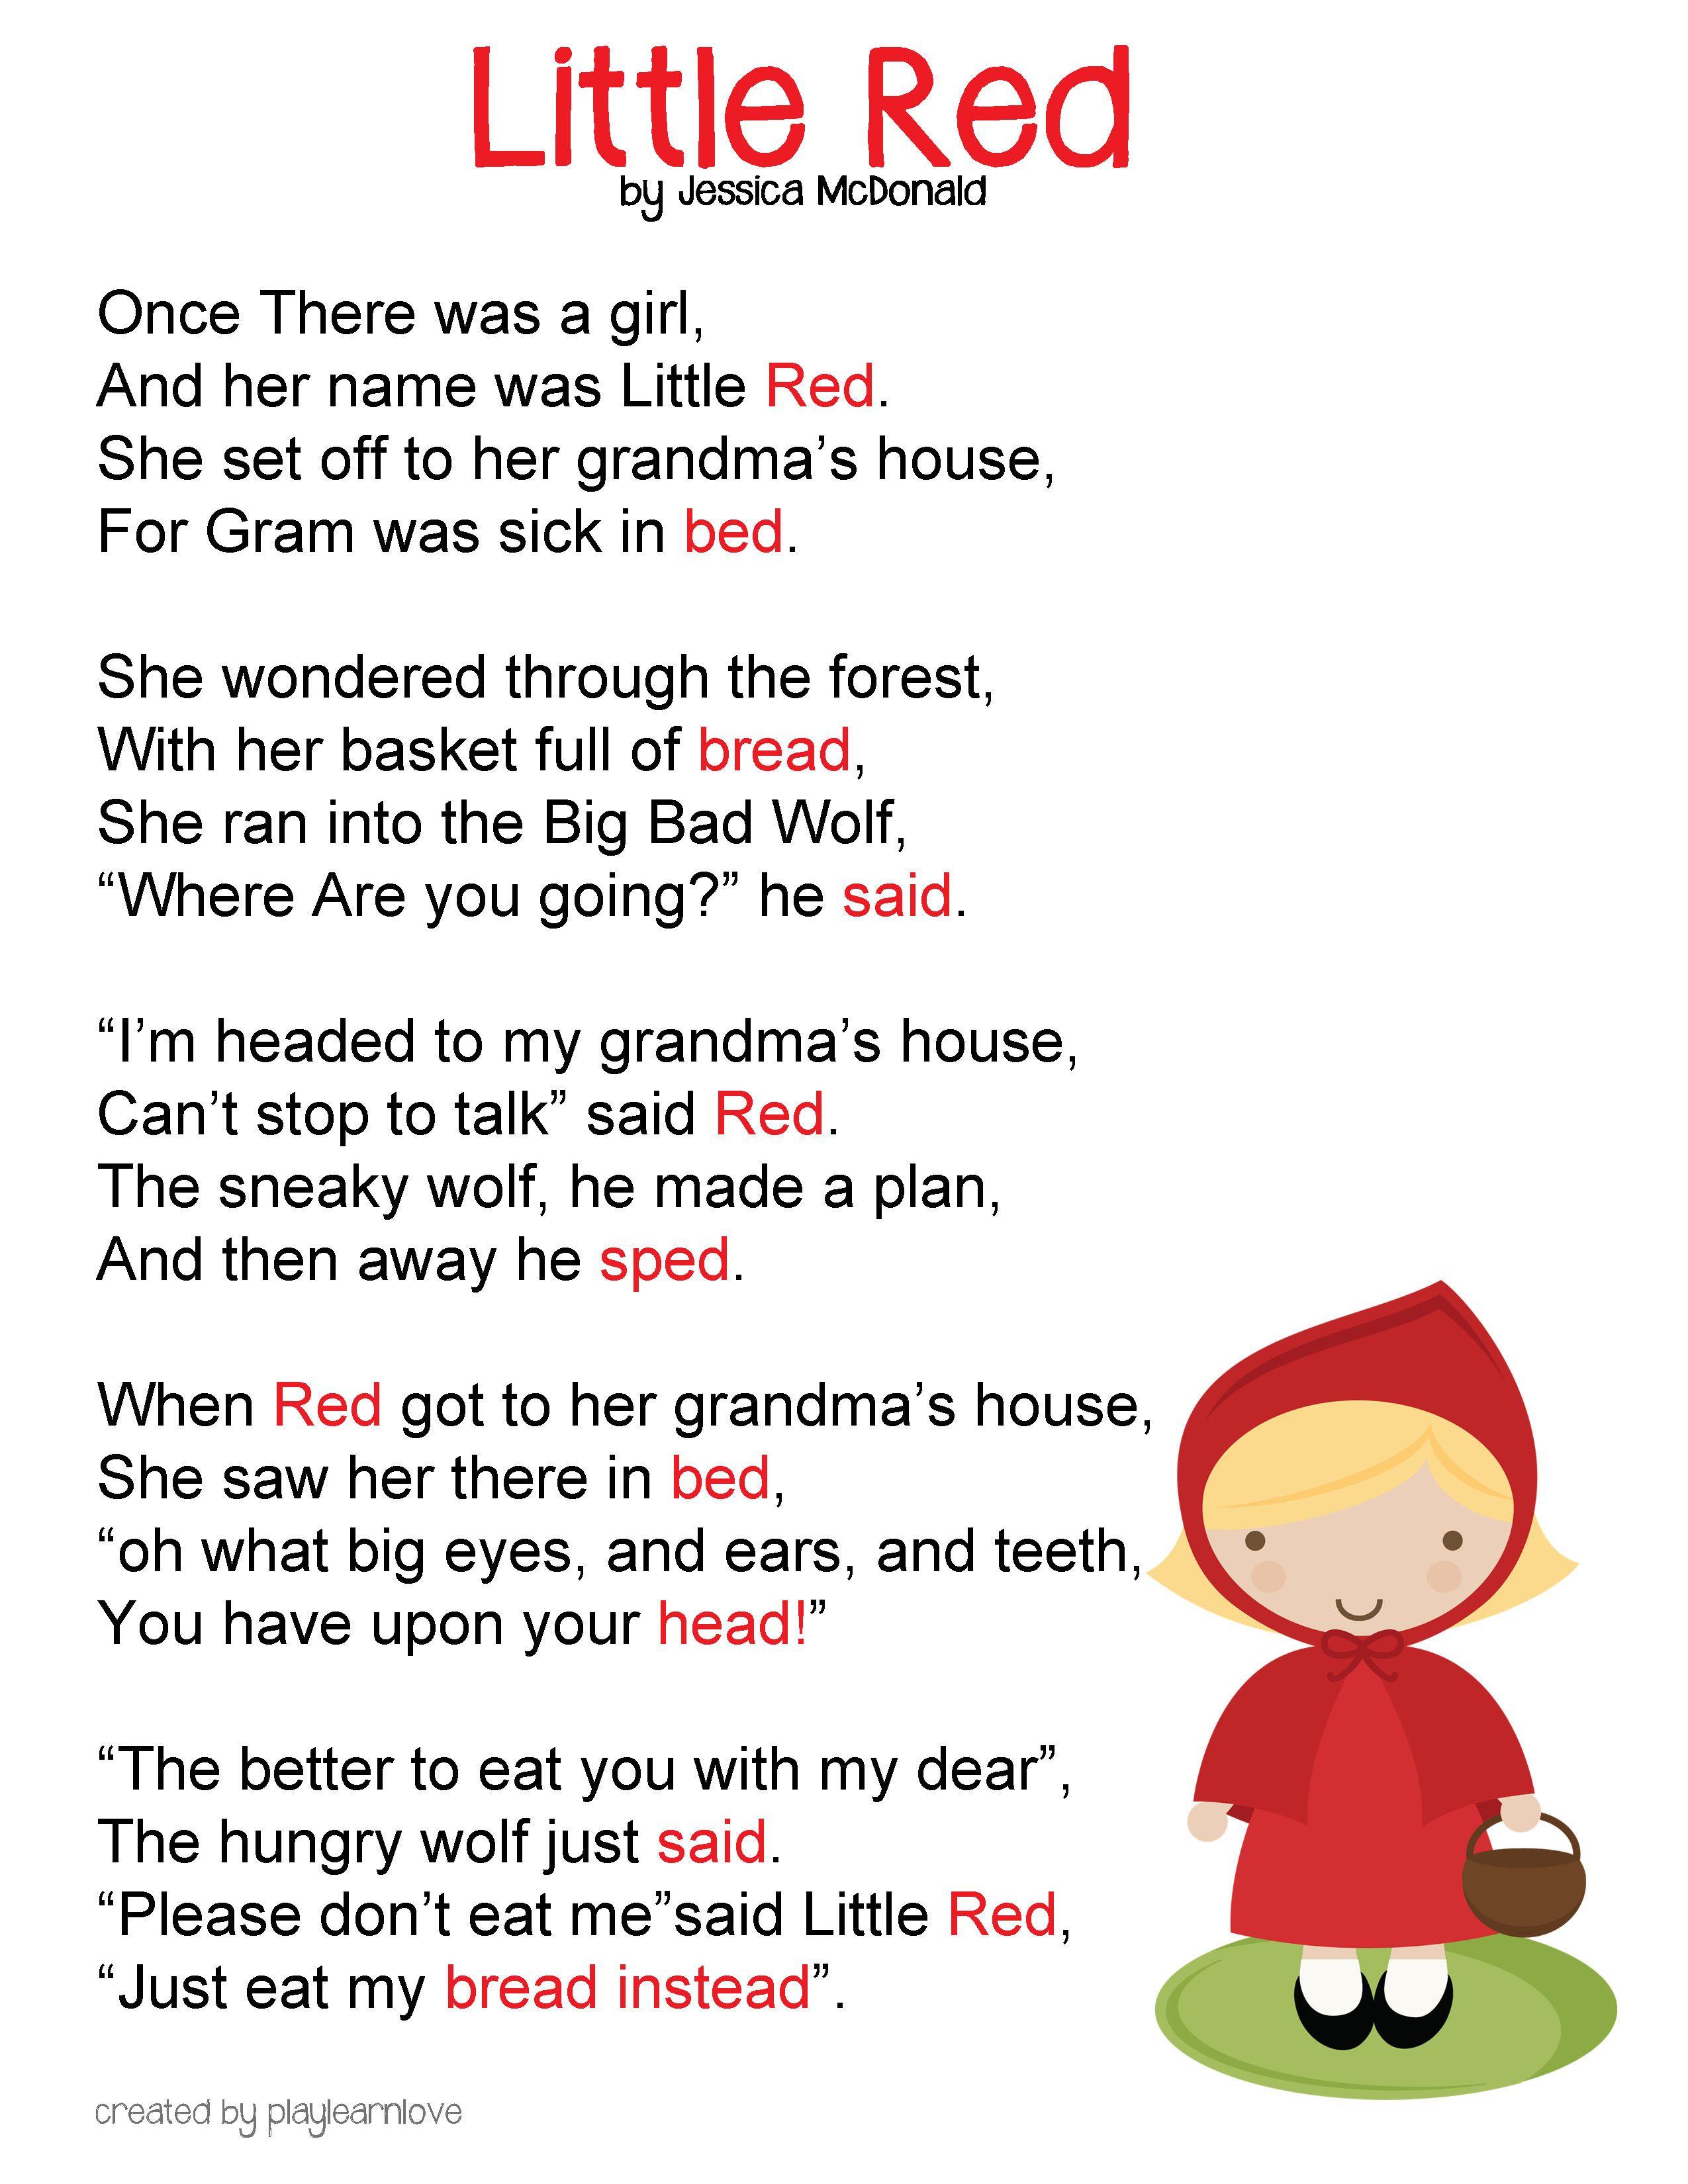 Worksheet Kindergarten Short Stories worksheet free printable stories for kindergarten mikyu short coffemix coffemix